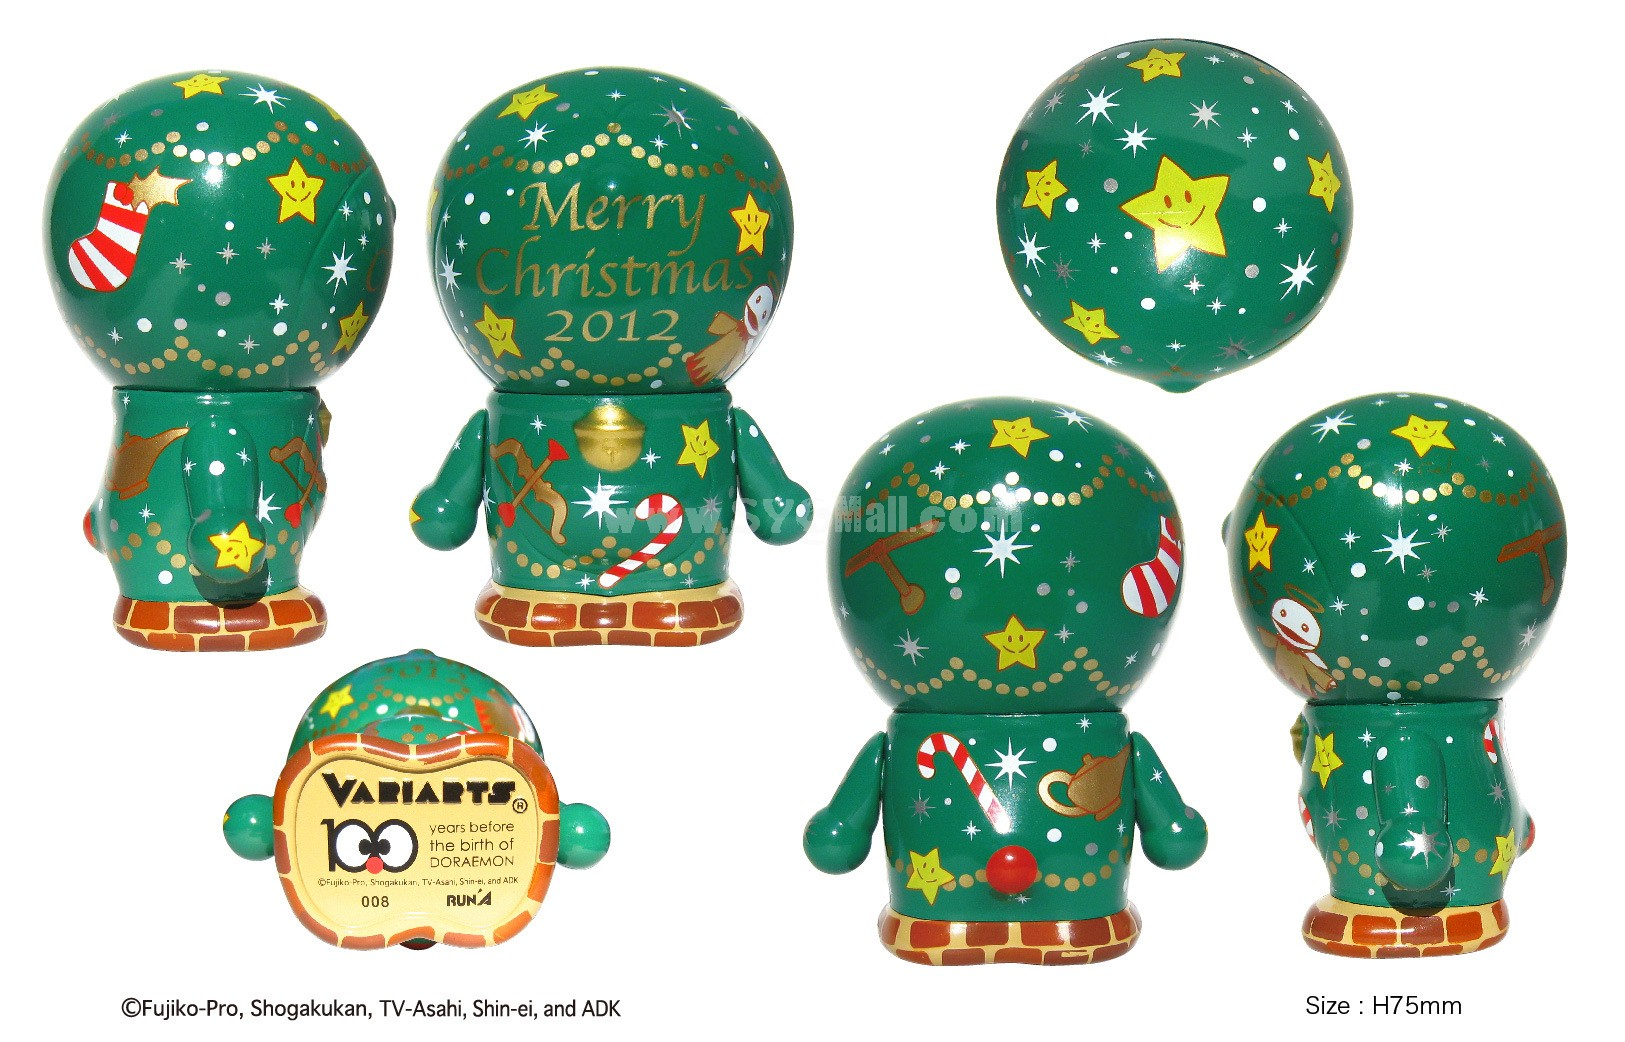 "Doraemon 100th Anniversary Edition Arm Moveable Figure Toy 7.5cm/2.9"" 008"